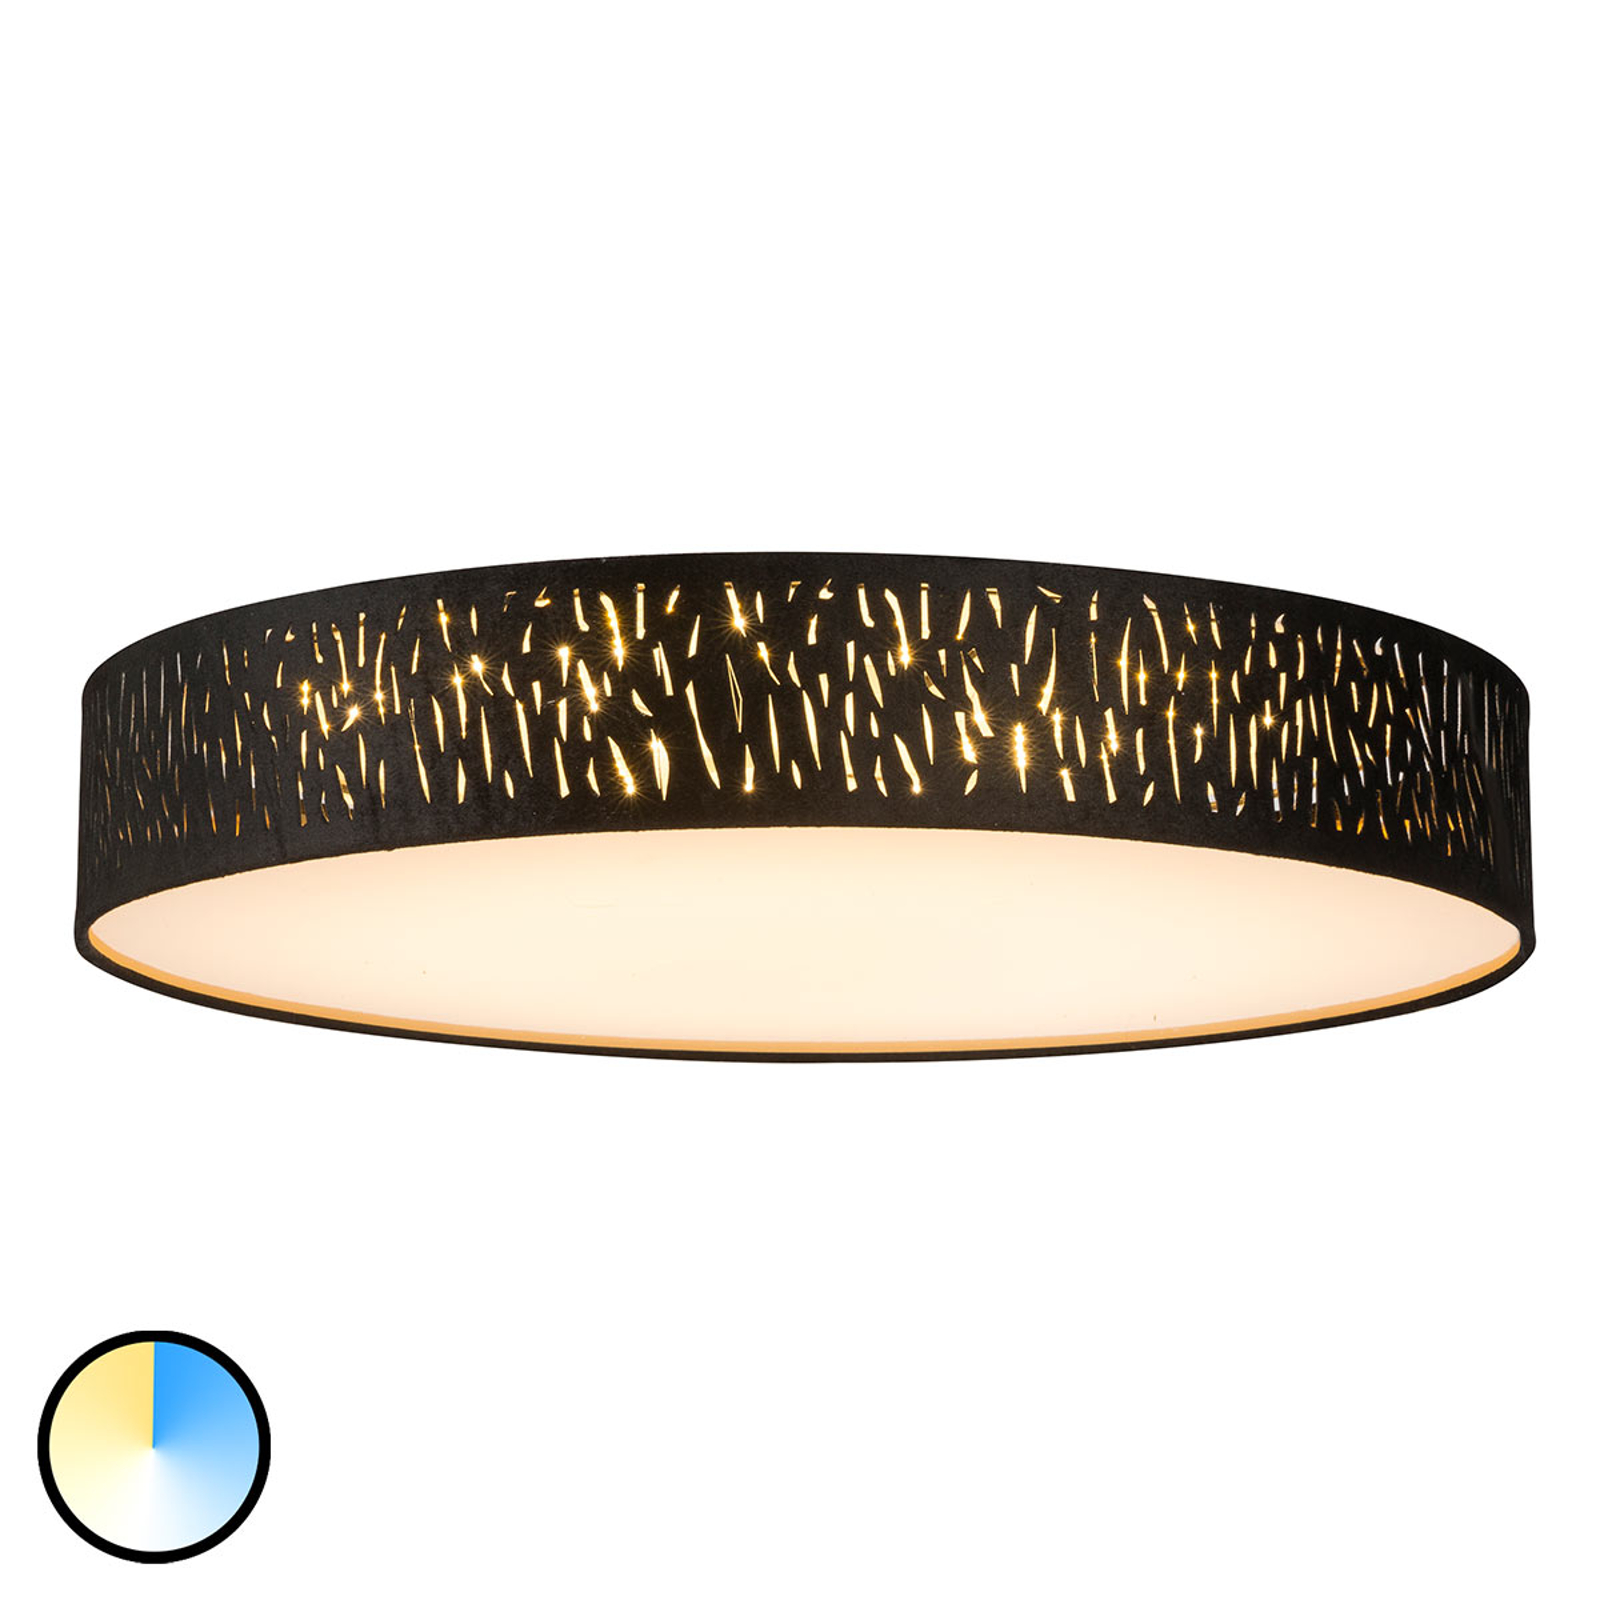 Lampa sufitowa LED Tuxon z funkcją Tunable White